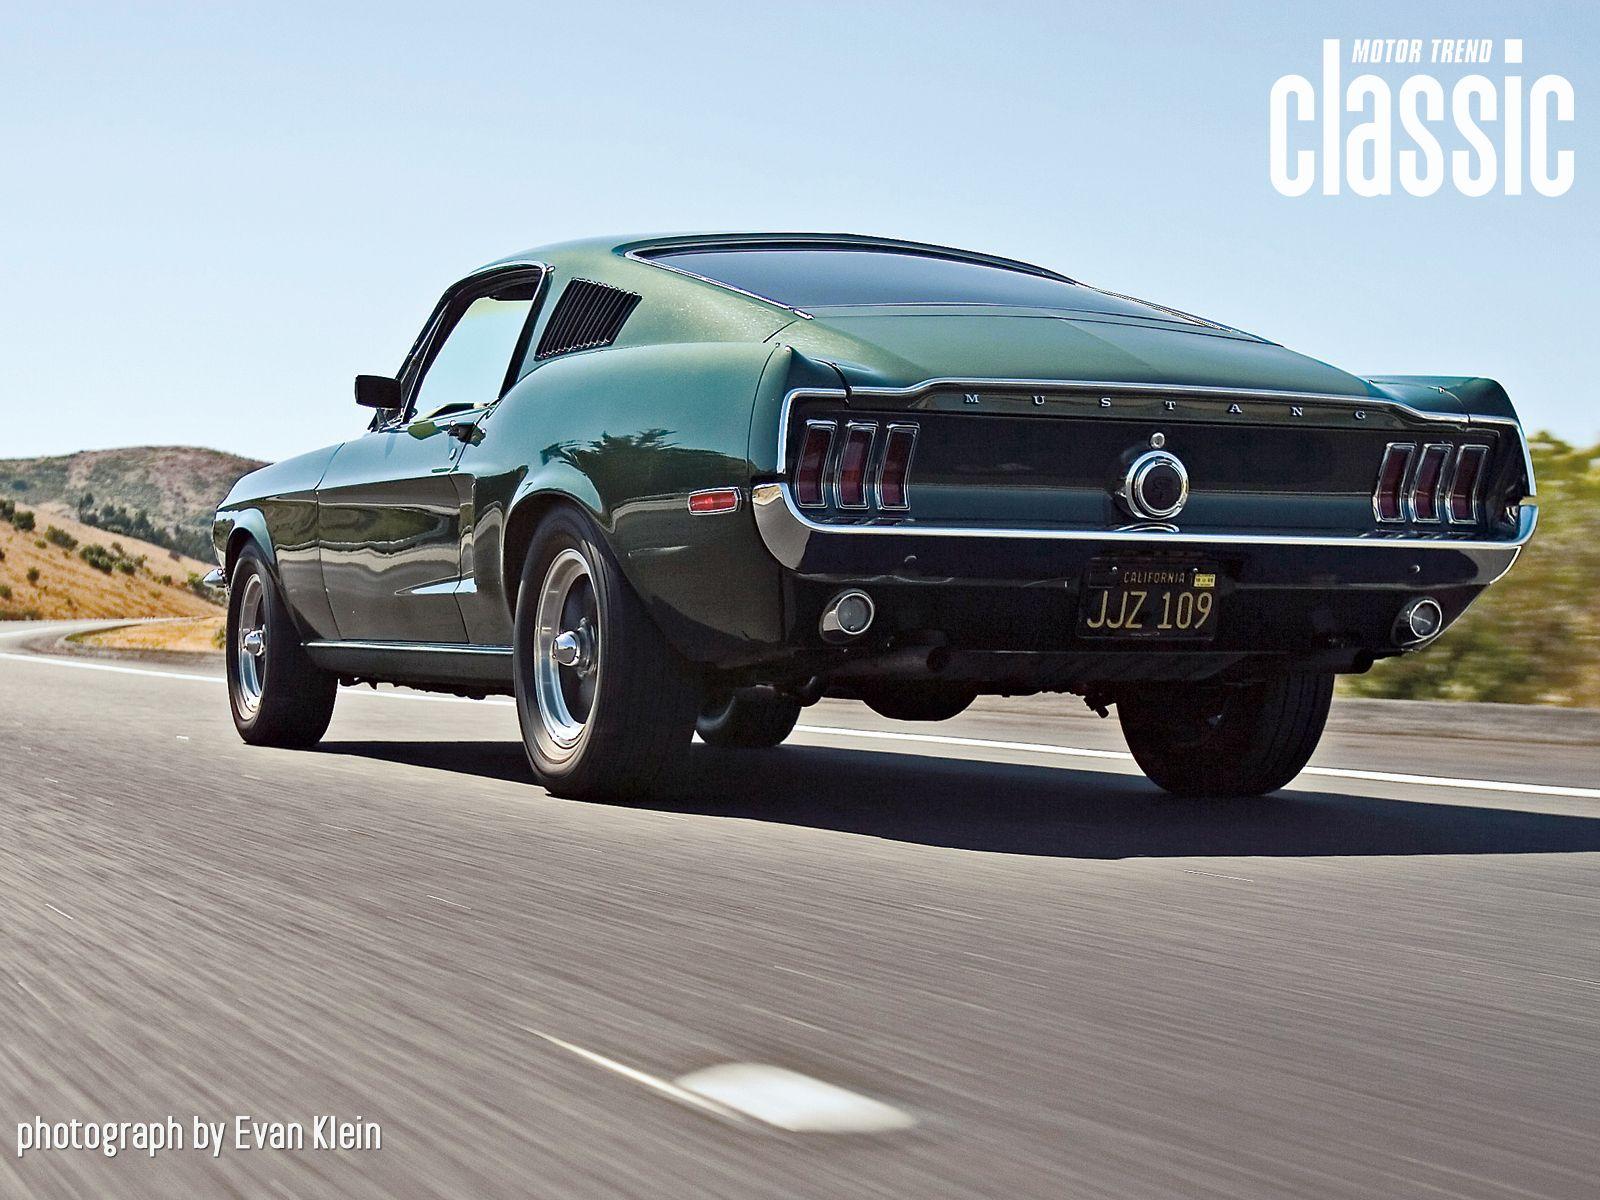 1968 Ford Mustang Gt 390 Bullitt Replica Wallpaper Gallery Motor Trend 1968 Ford Mustang Fastback Mustang Fastback Ford Mustang